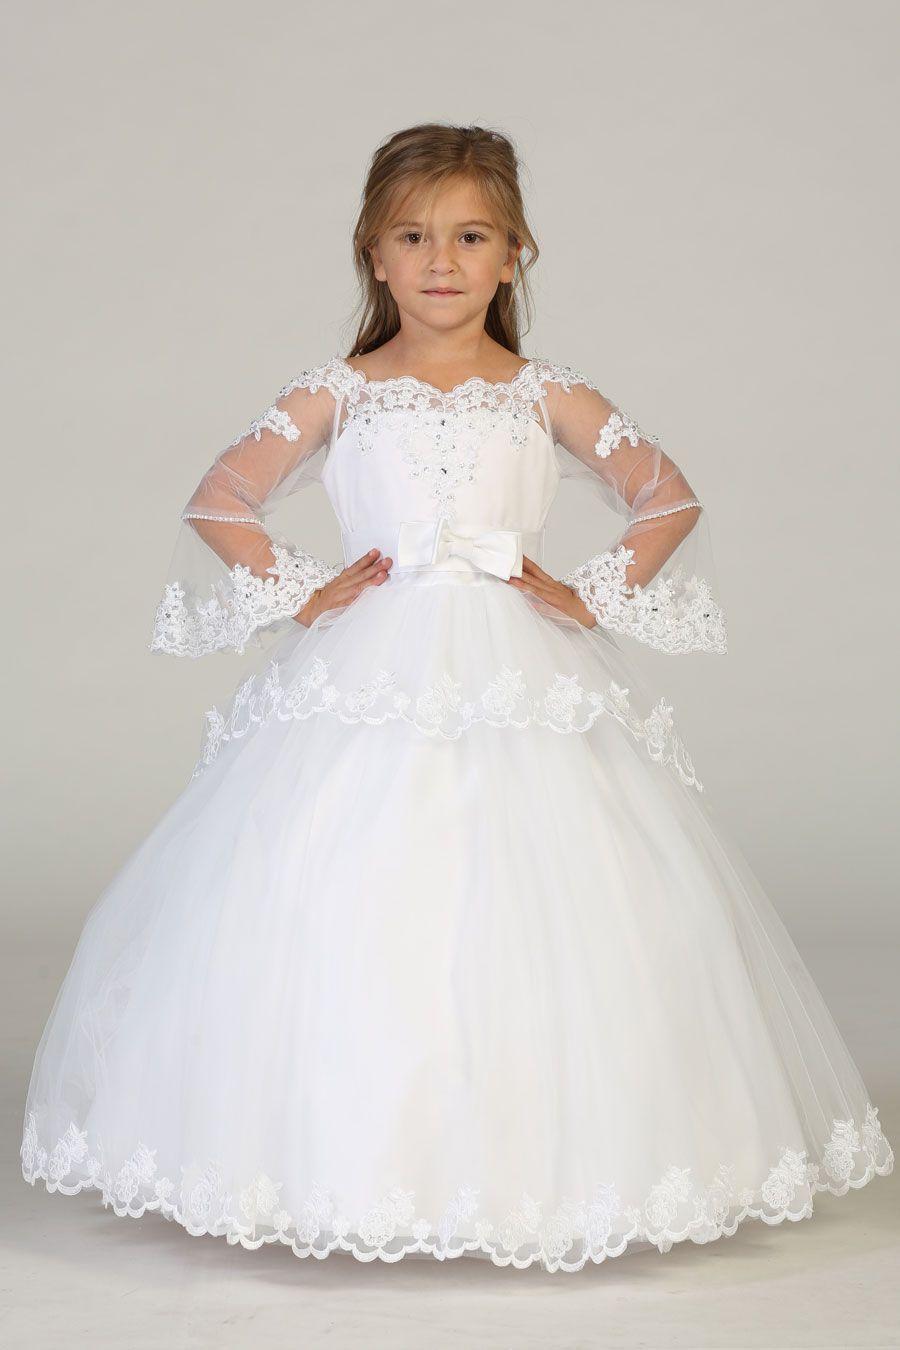 8033 1 Girls Long Sleeve Communion Dress Bijankids Girls Long Sleeve Dresses Tulle Dress Short Tulle Dress Long [ 1350 x 900 Pixel ]